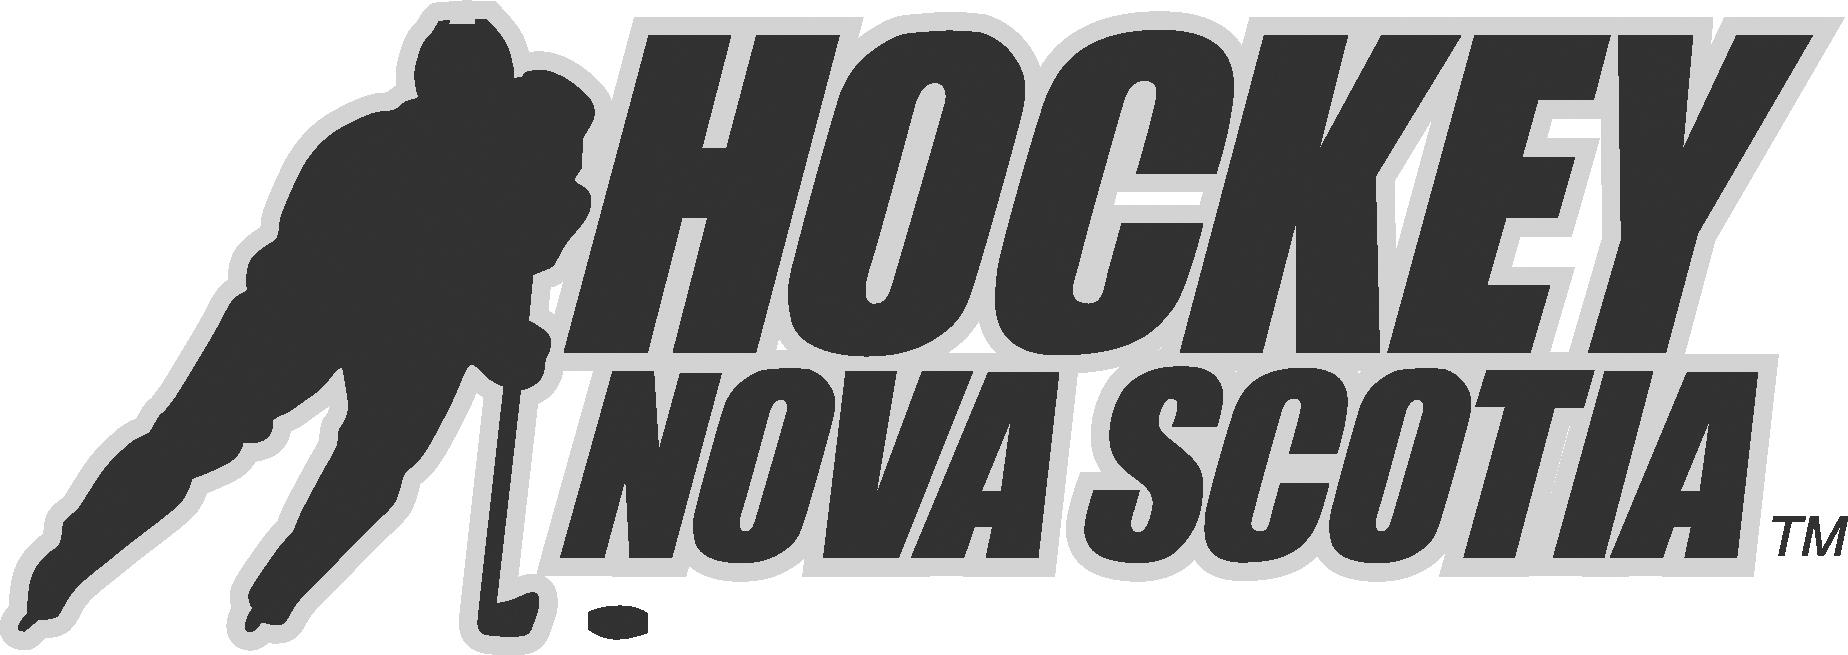 hockey nova scotia BW.jpg